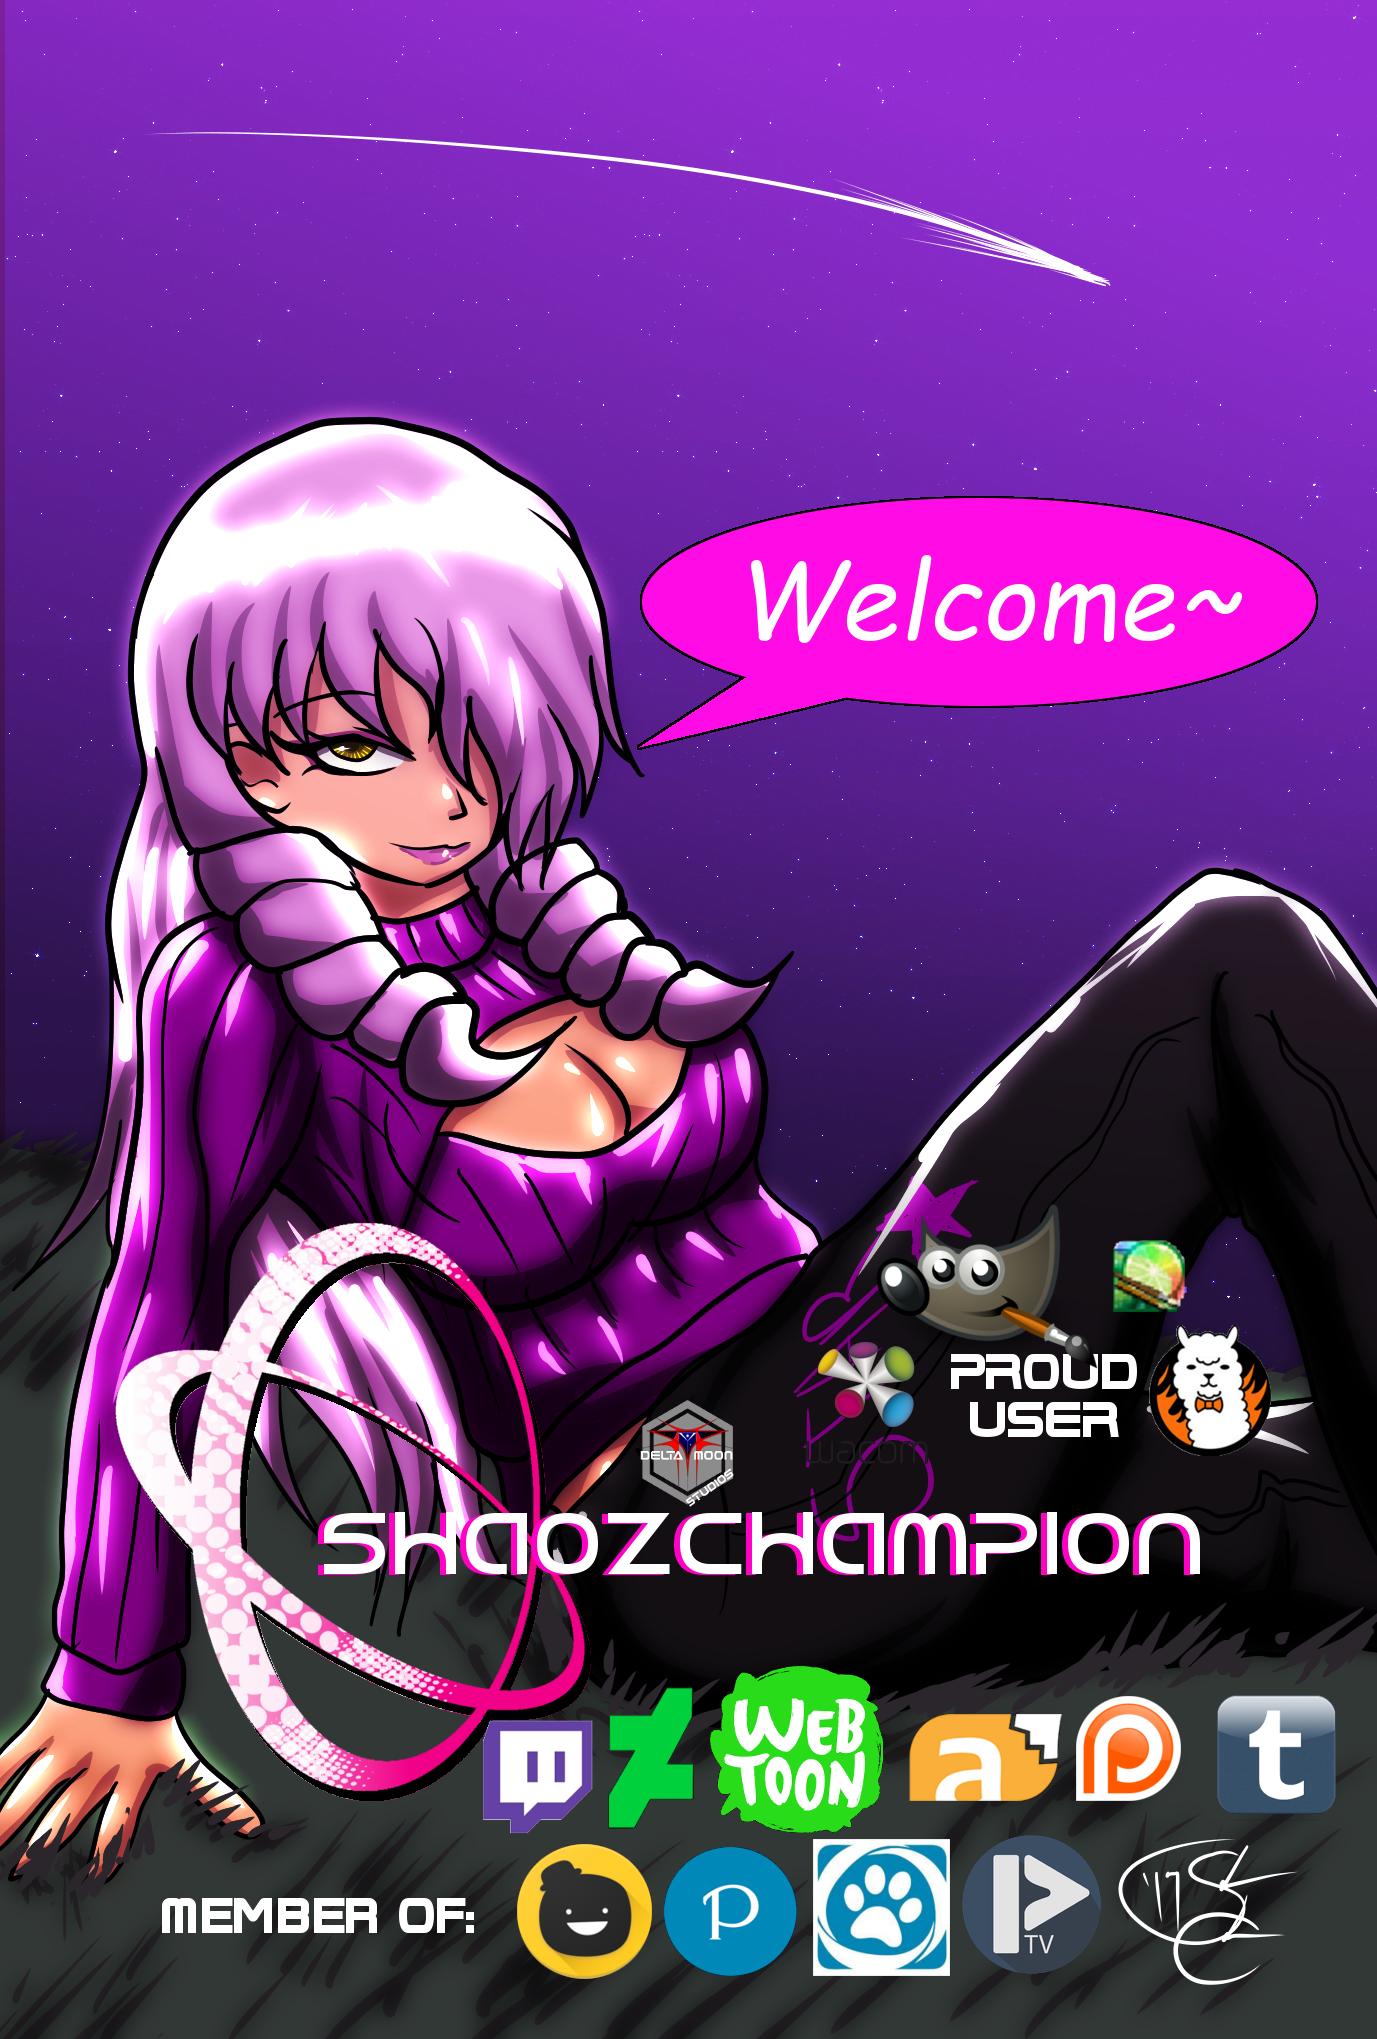 2017 ID by ShaozChampion